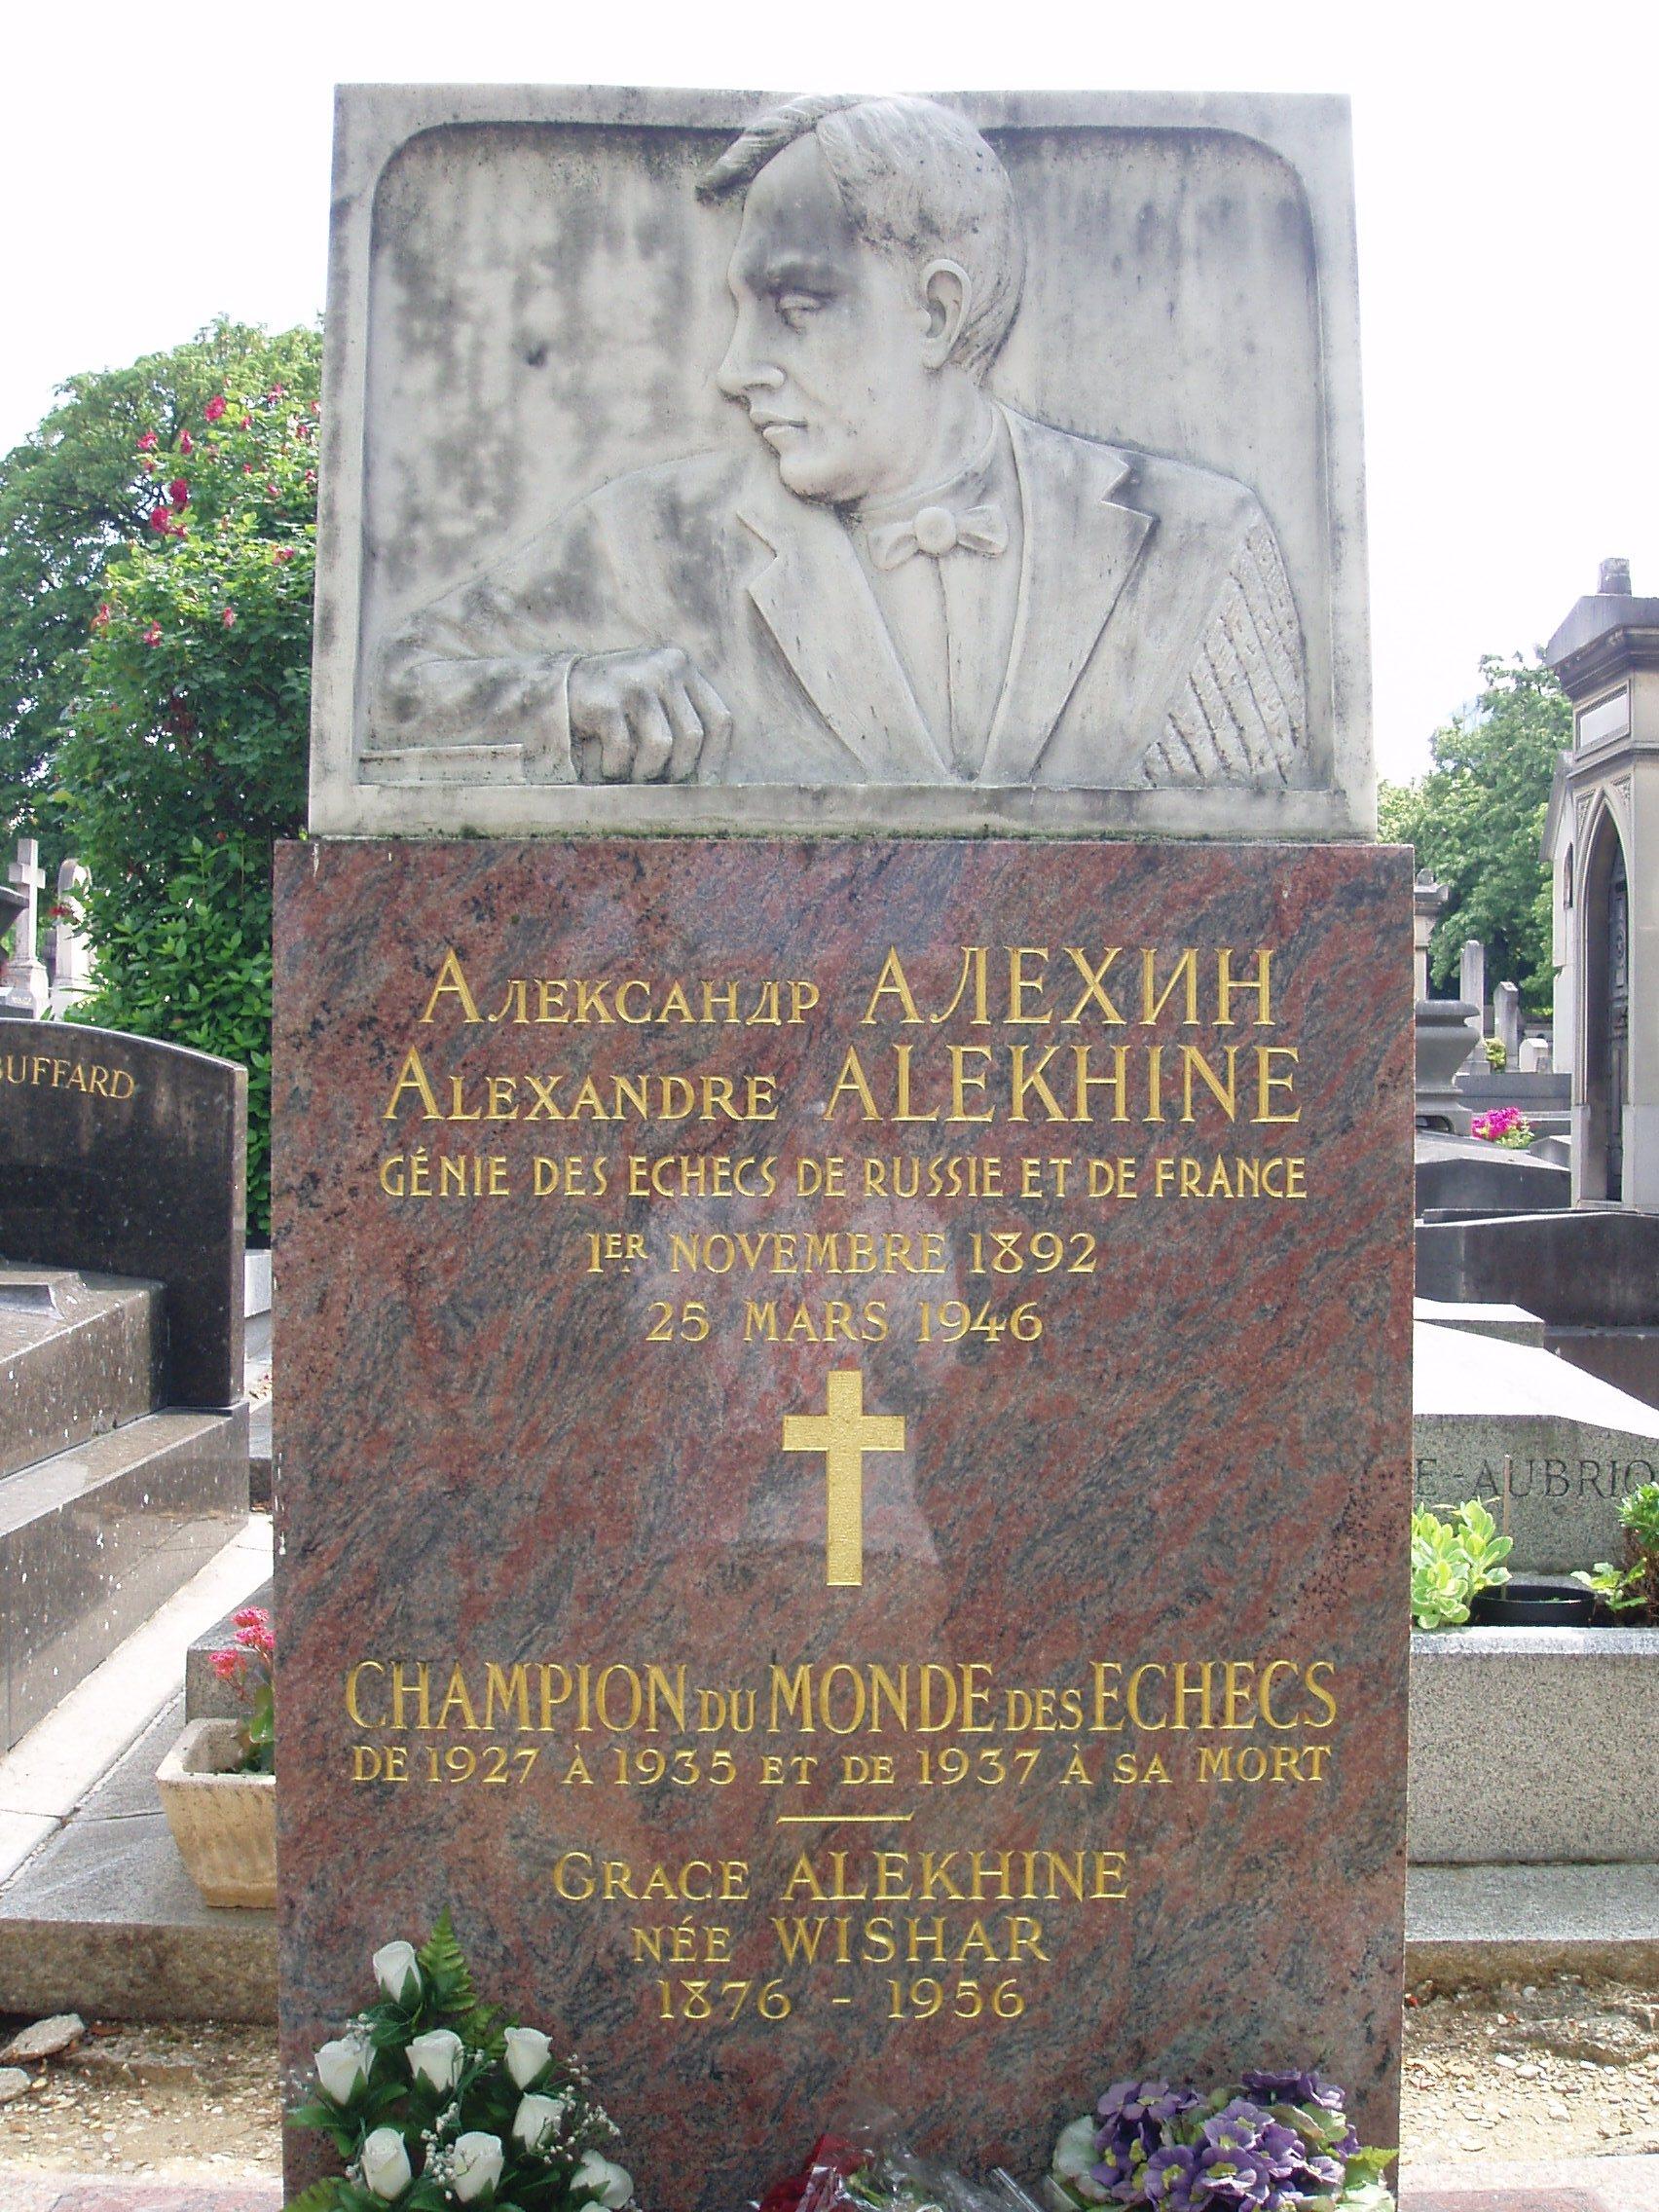 File:Grave of Alexander Alekhine in Paris.JPG - Wikimedia Commons